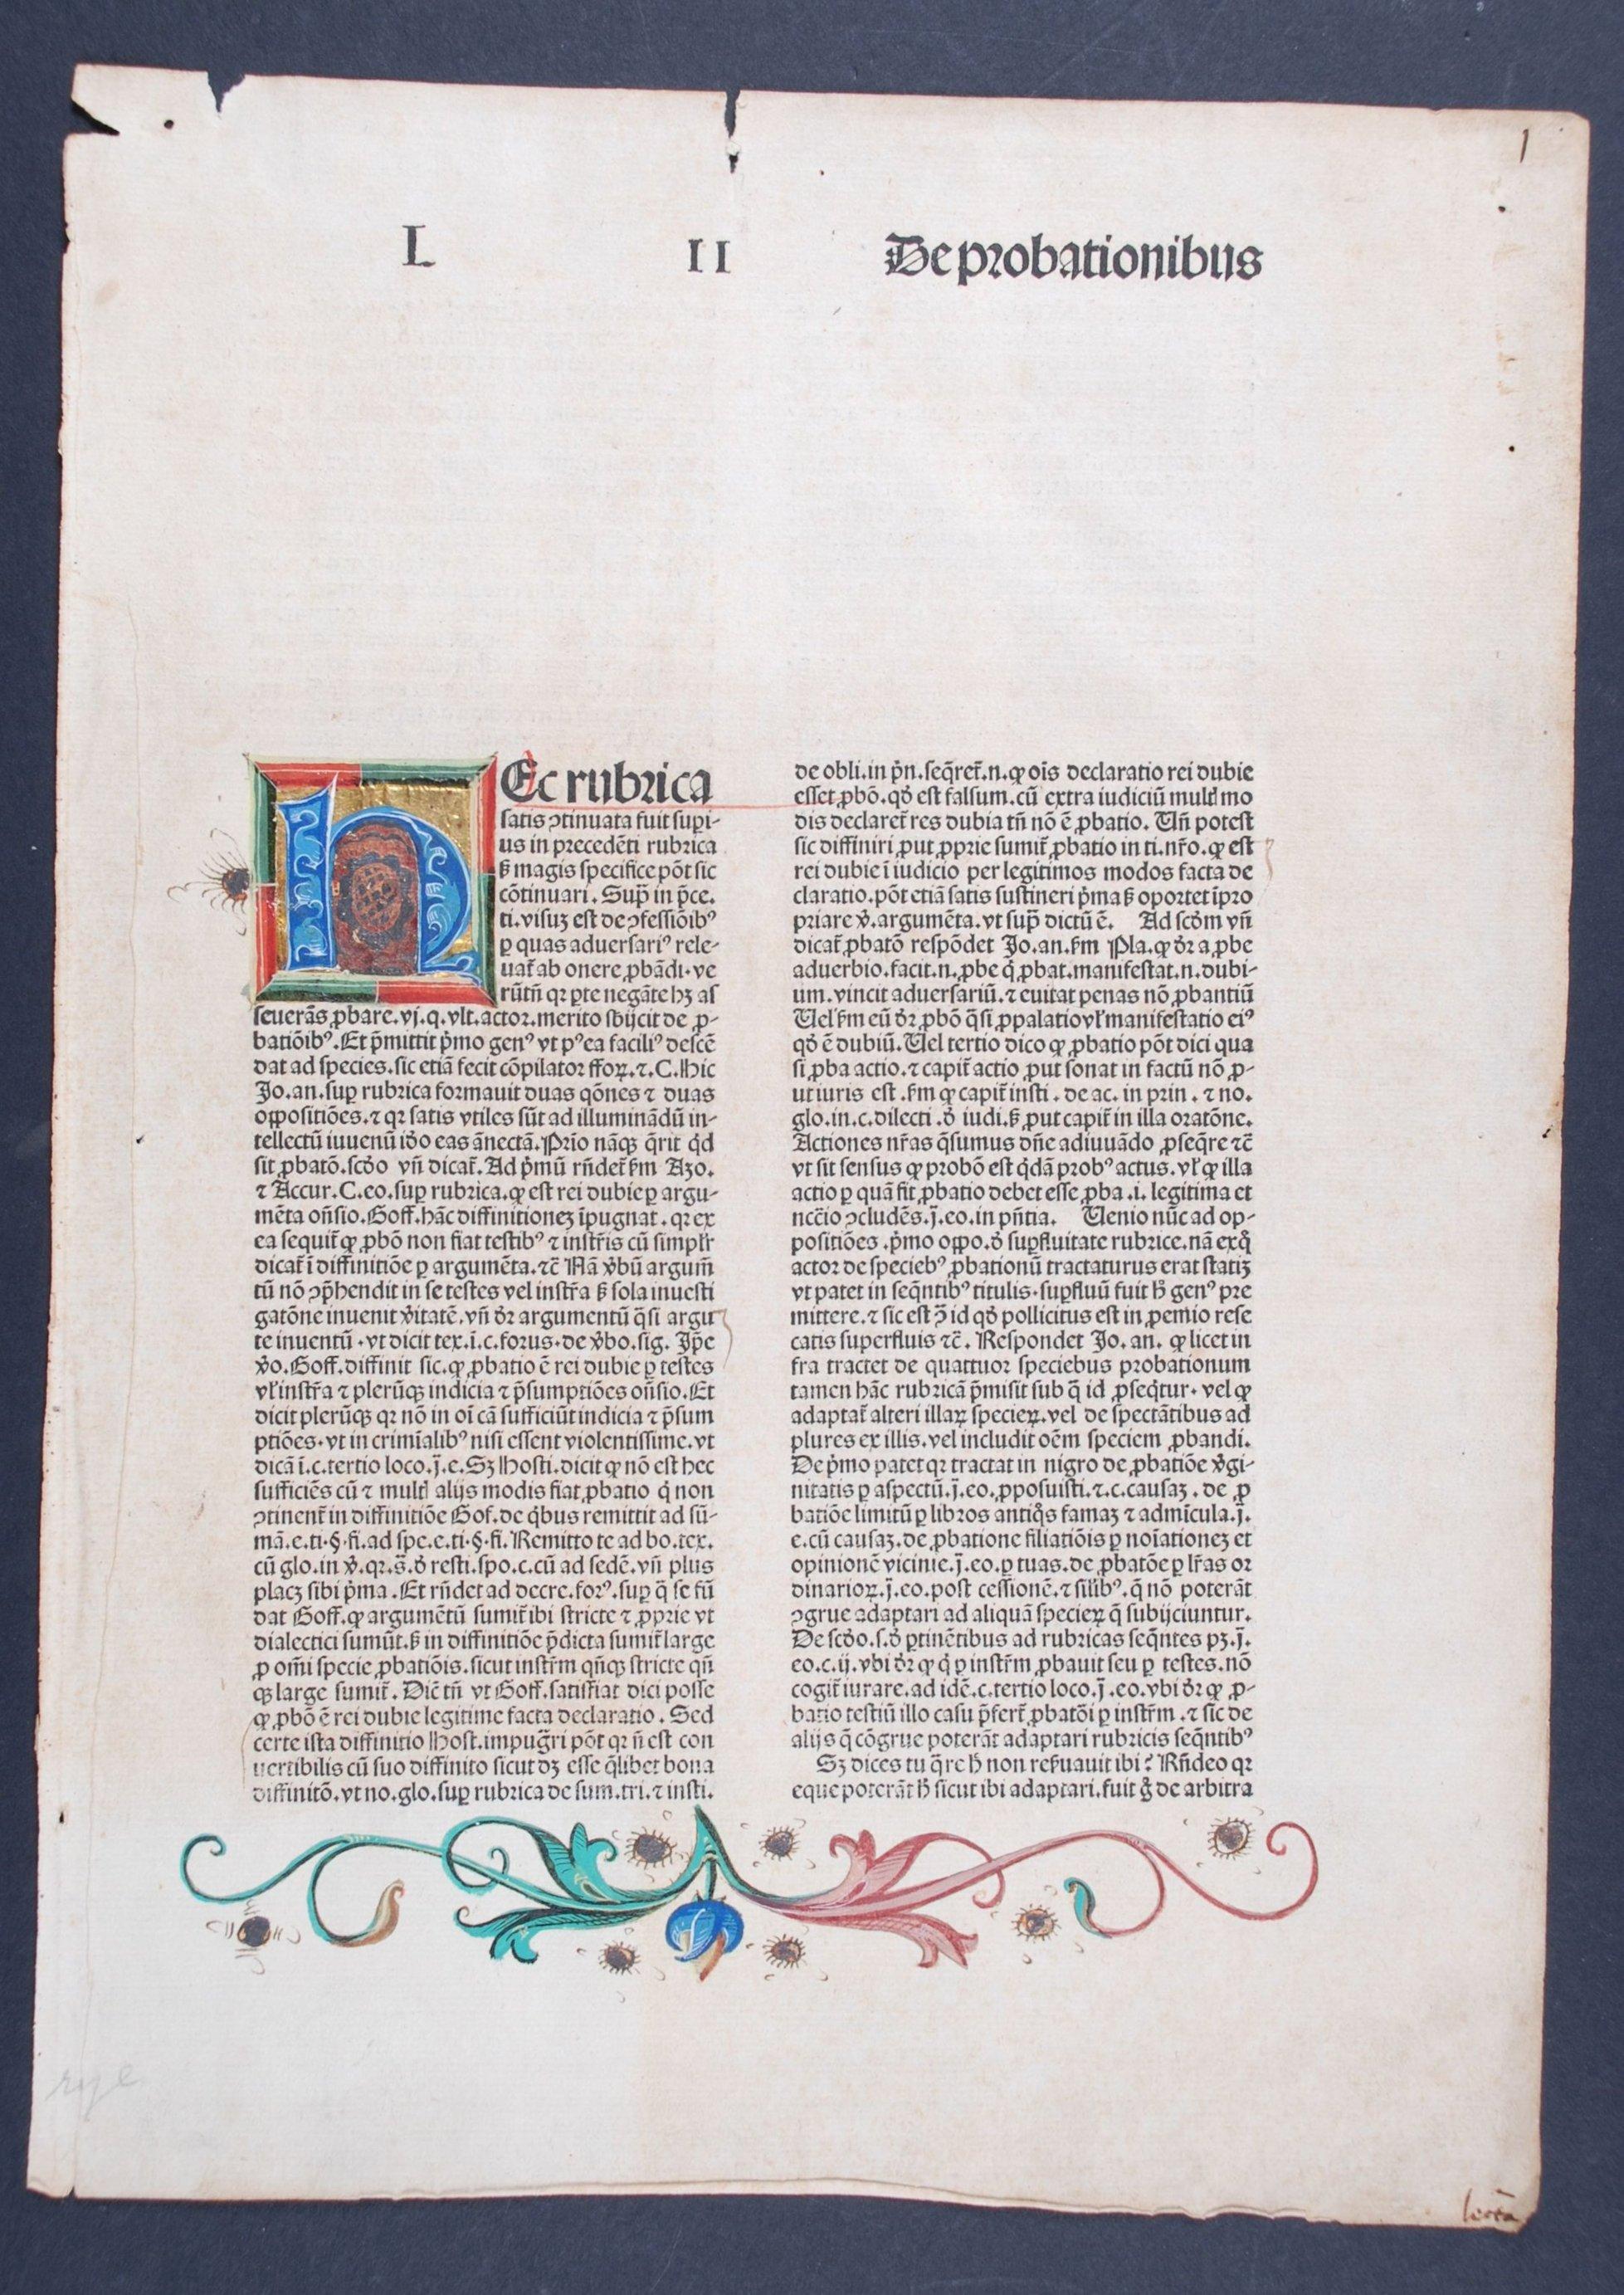 Single leaf from: Niccolò de' Tudeschi. Lectura super V libris Decretalium. Basel: Johann Amerbach, 1487-1488.